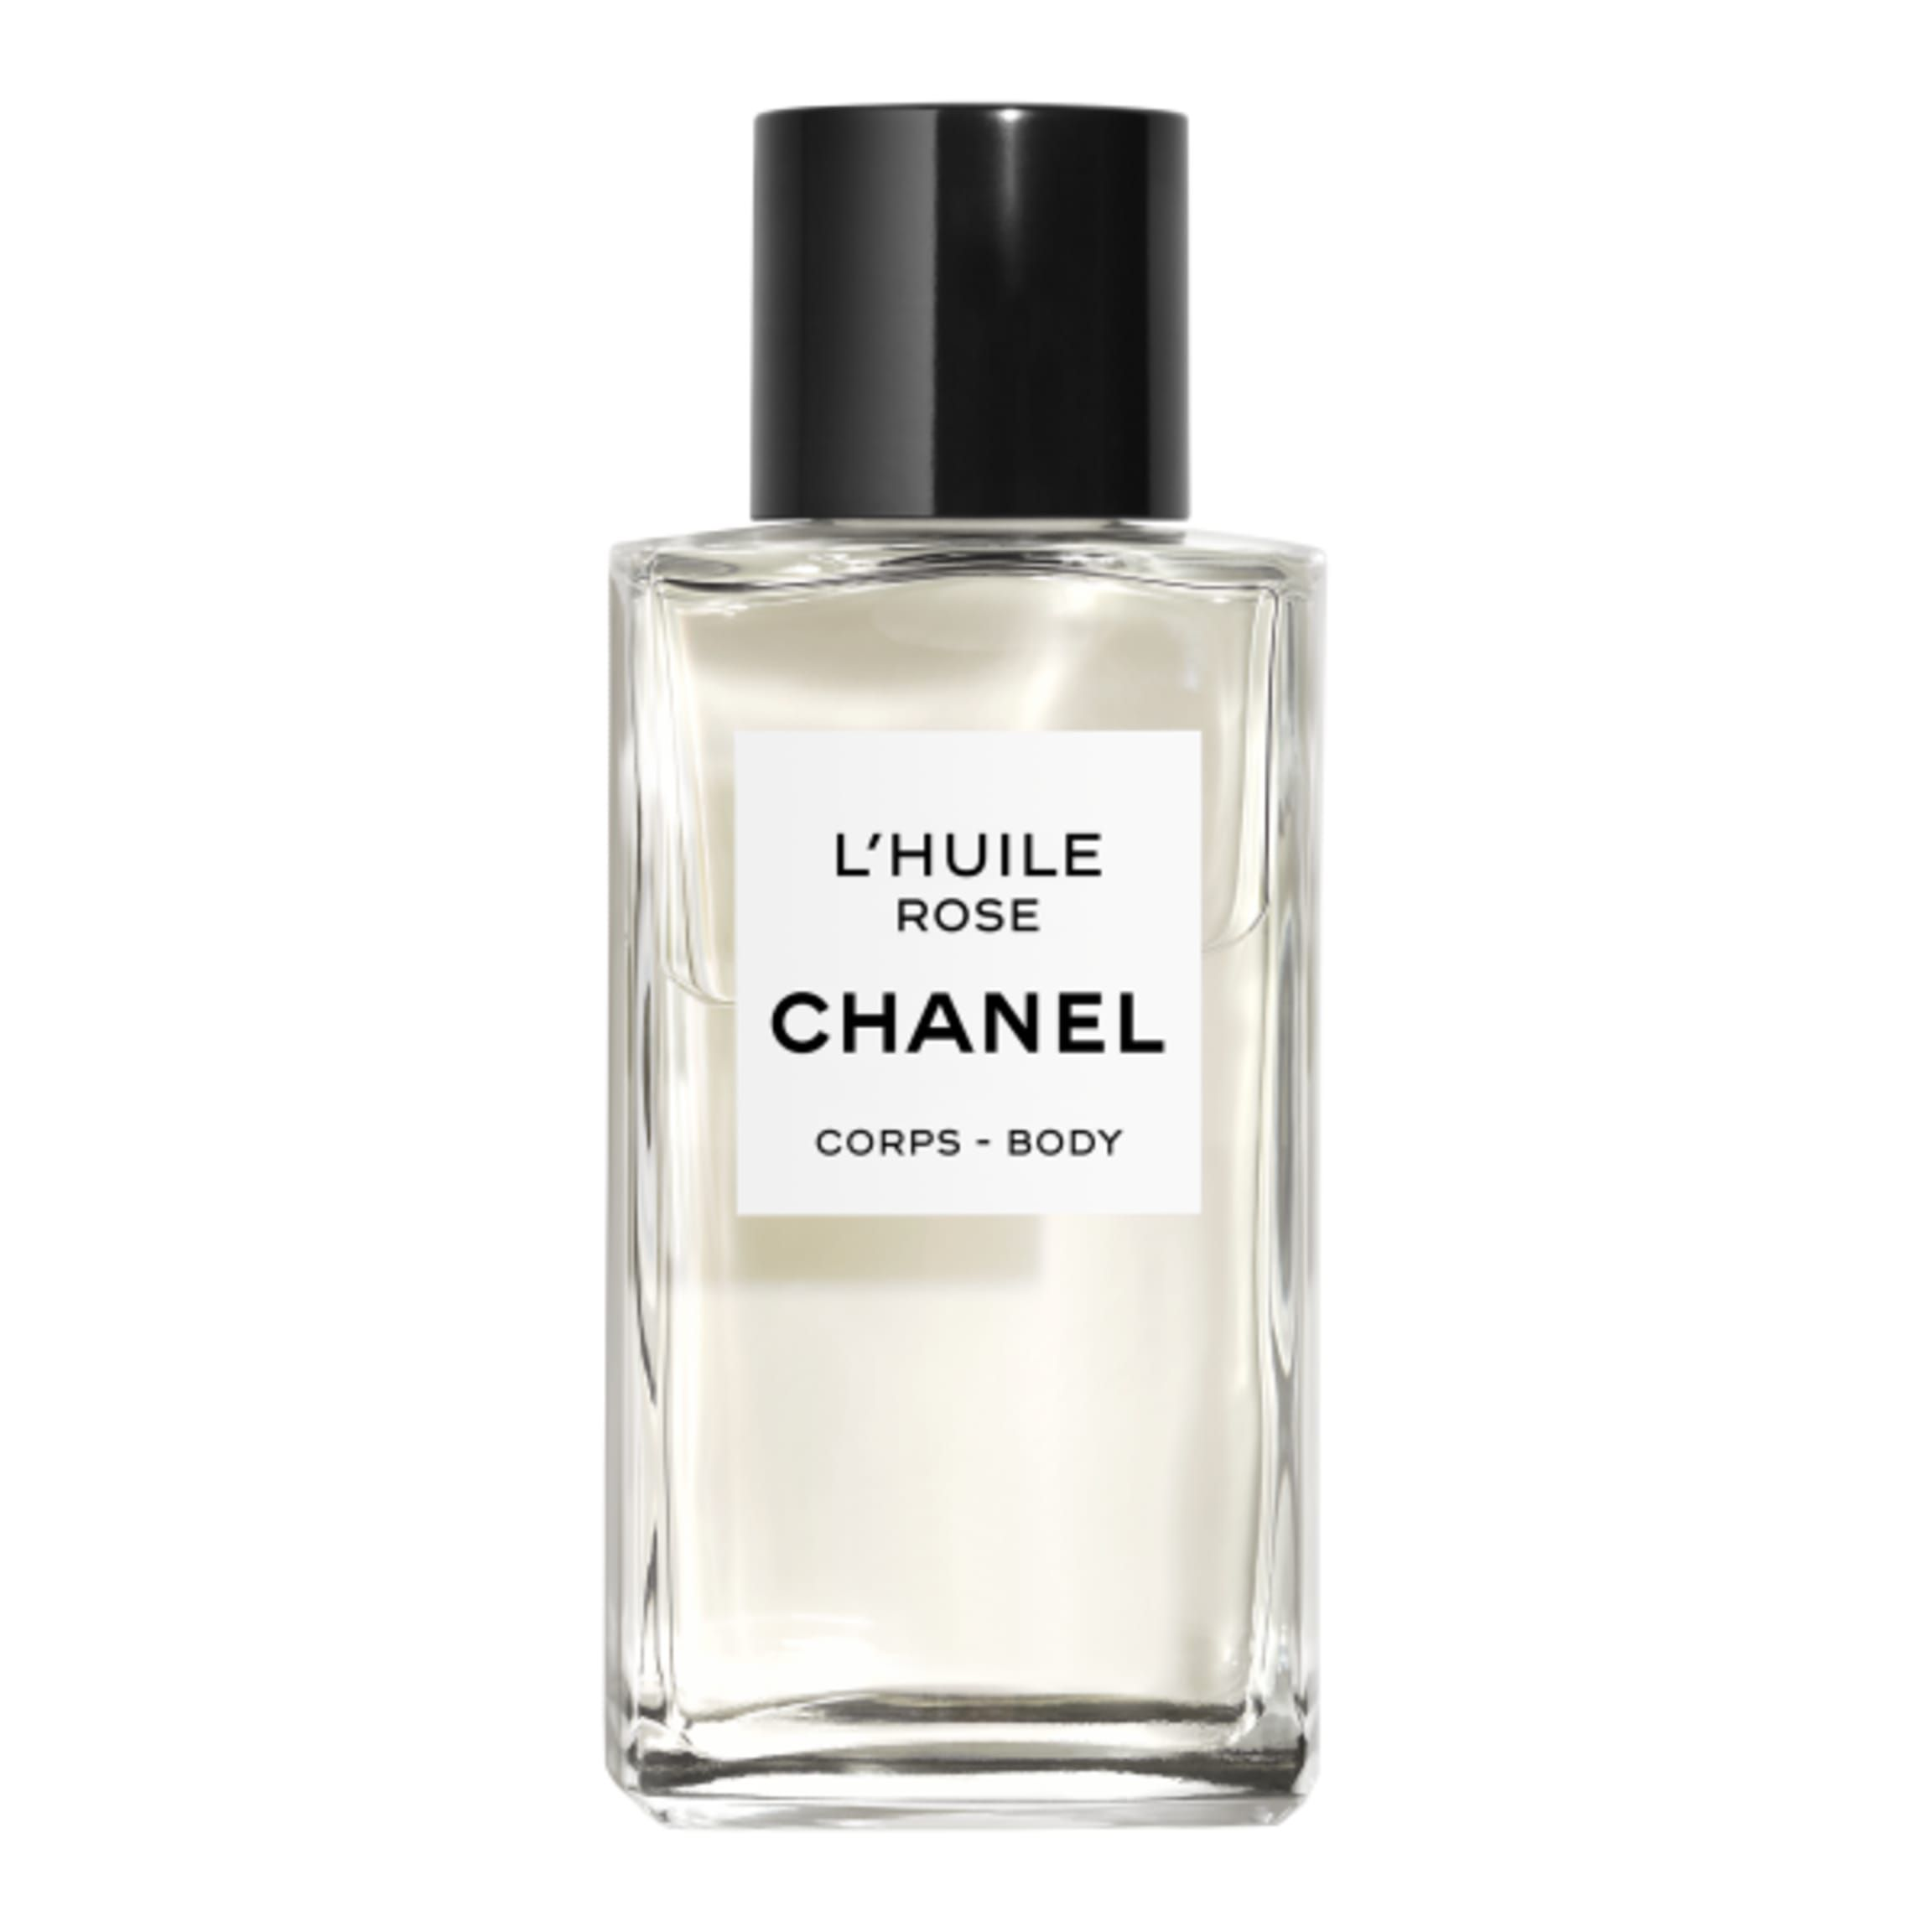 Chanel L'HUILE ROSE Body Massage Oil